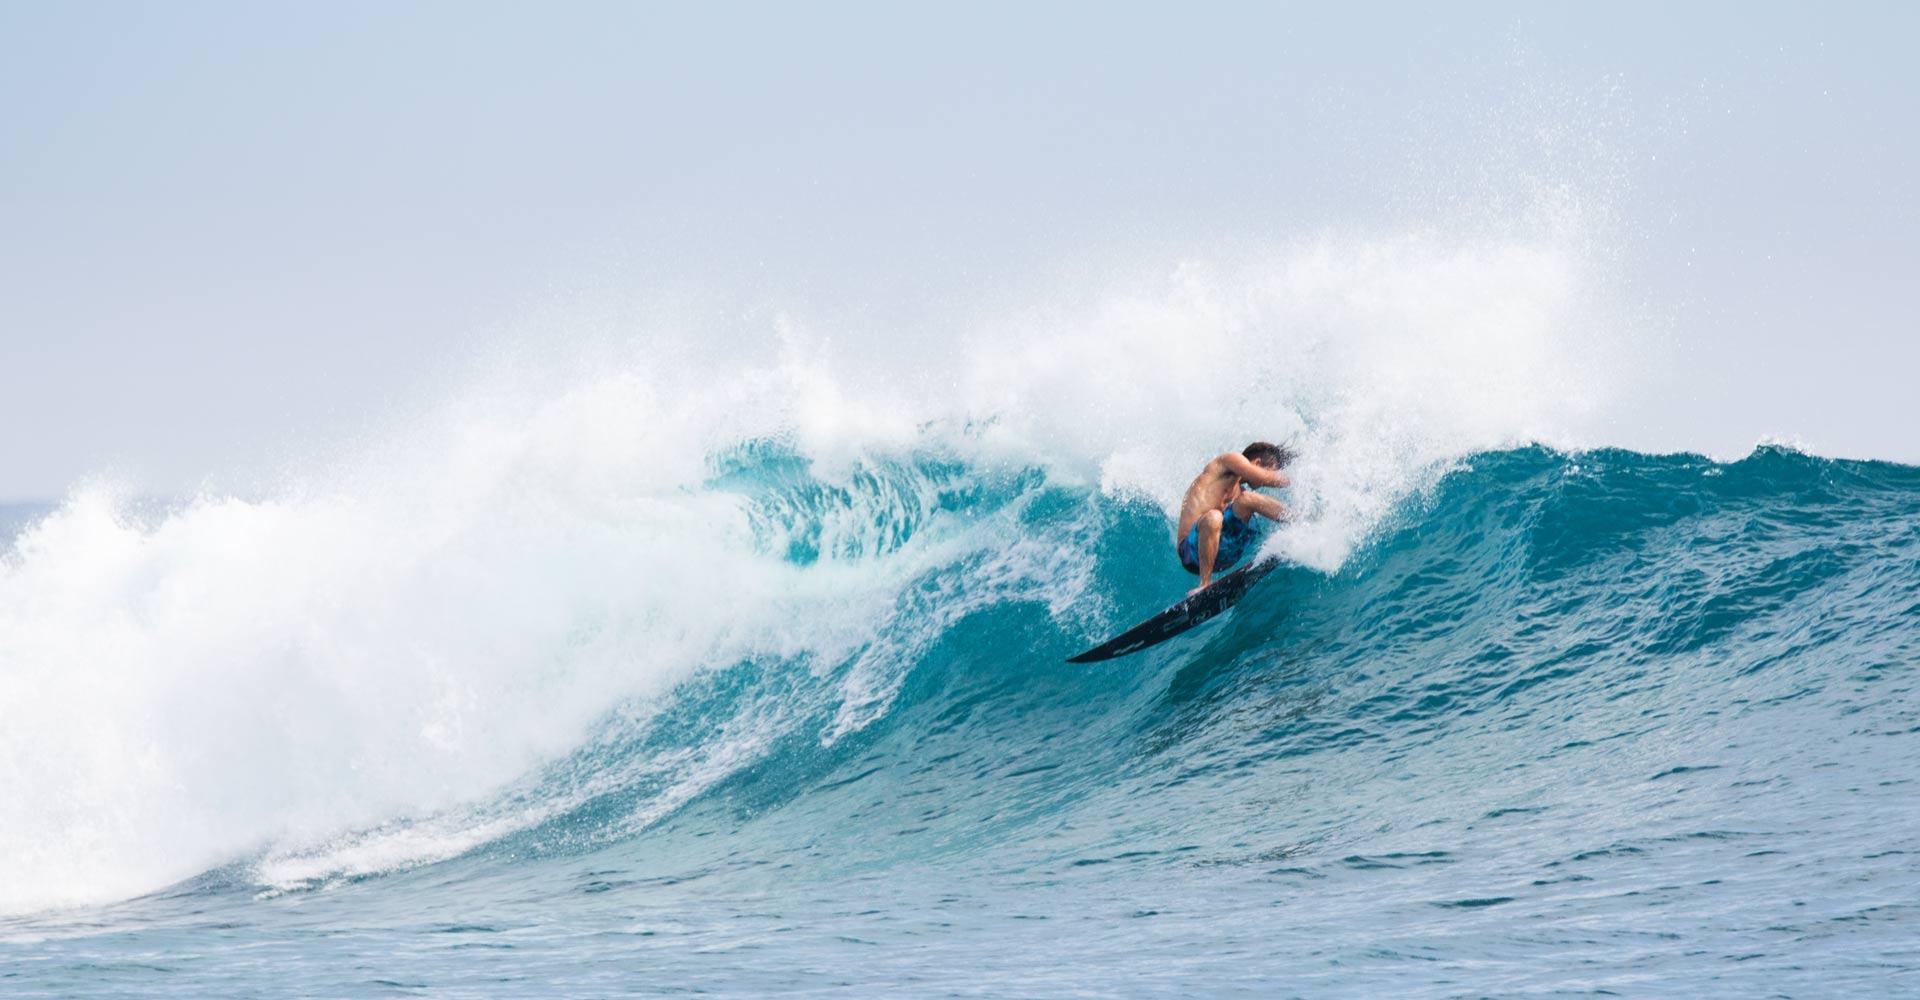 Jackson Coffey Surfing in front of Niyama Surf Resort